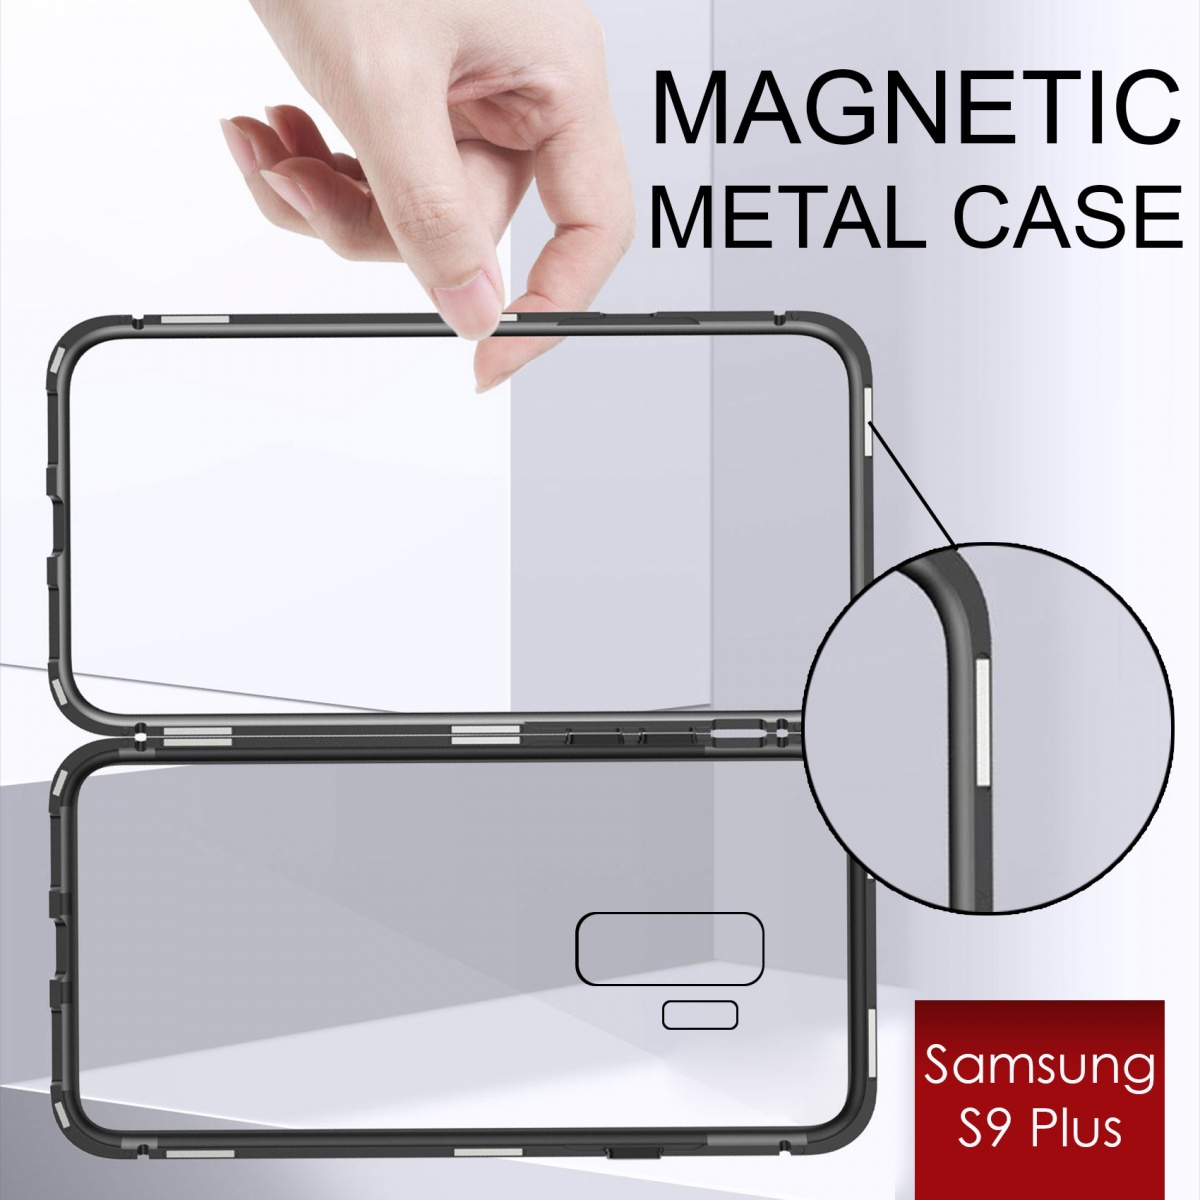 Samsung S9 Plus Magnetic Metal Flip Phone Case - Black